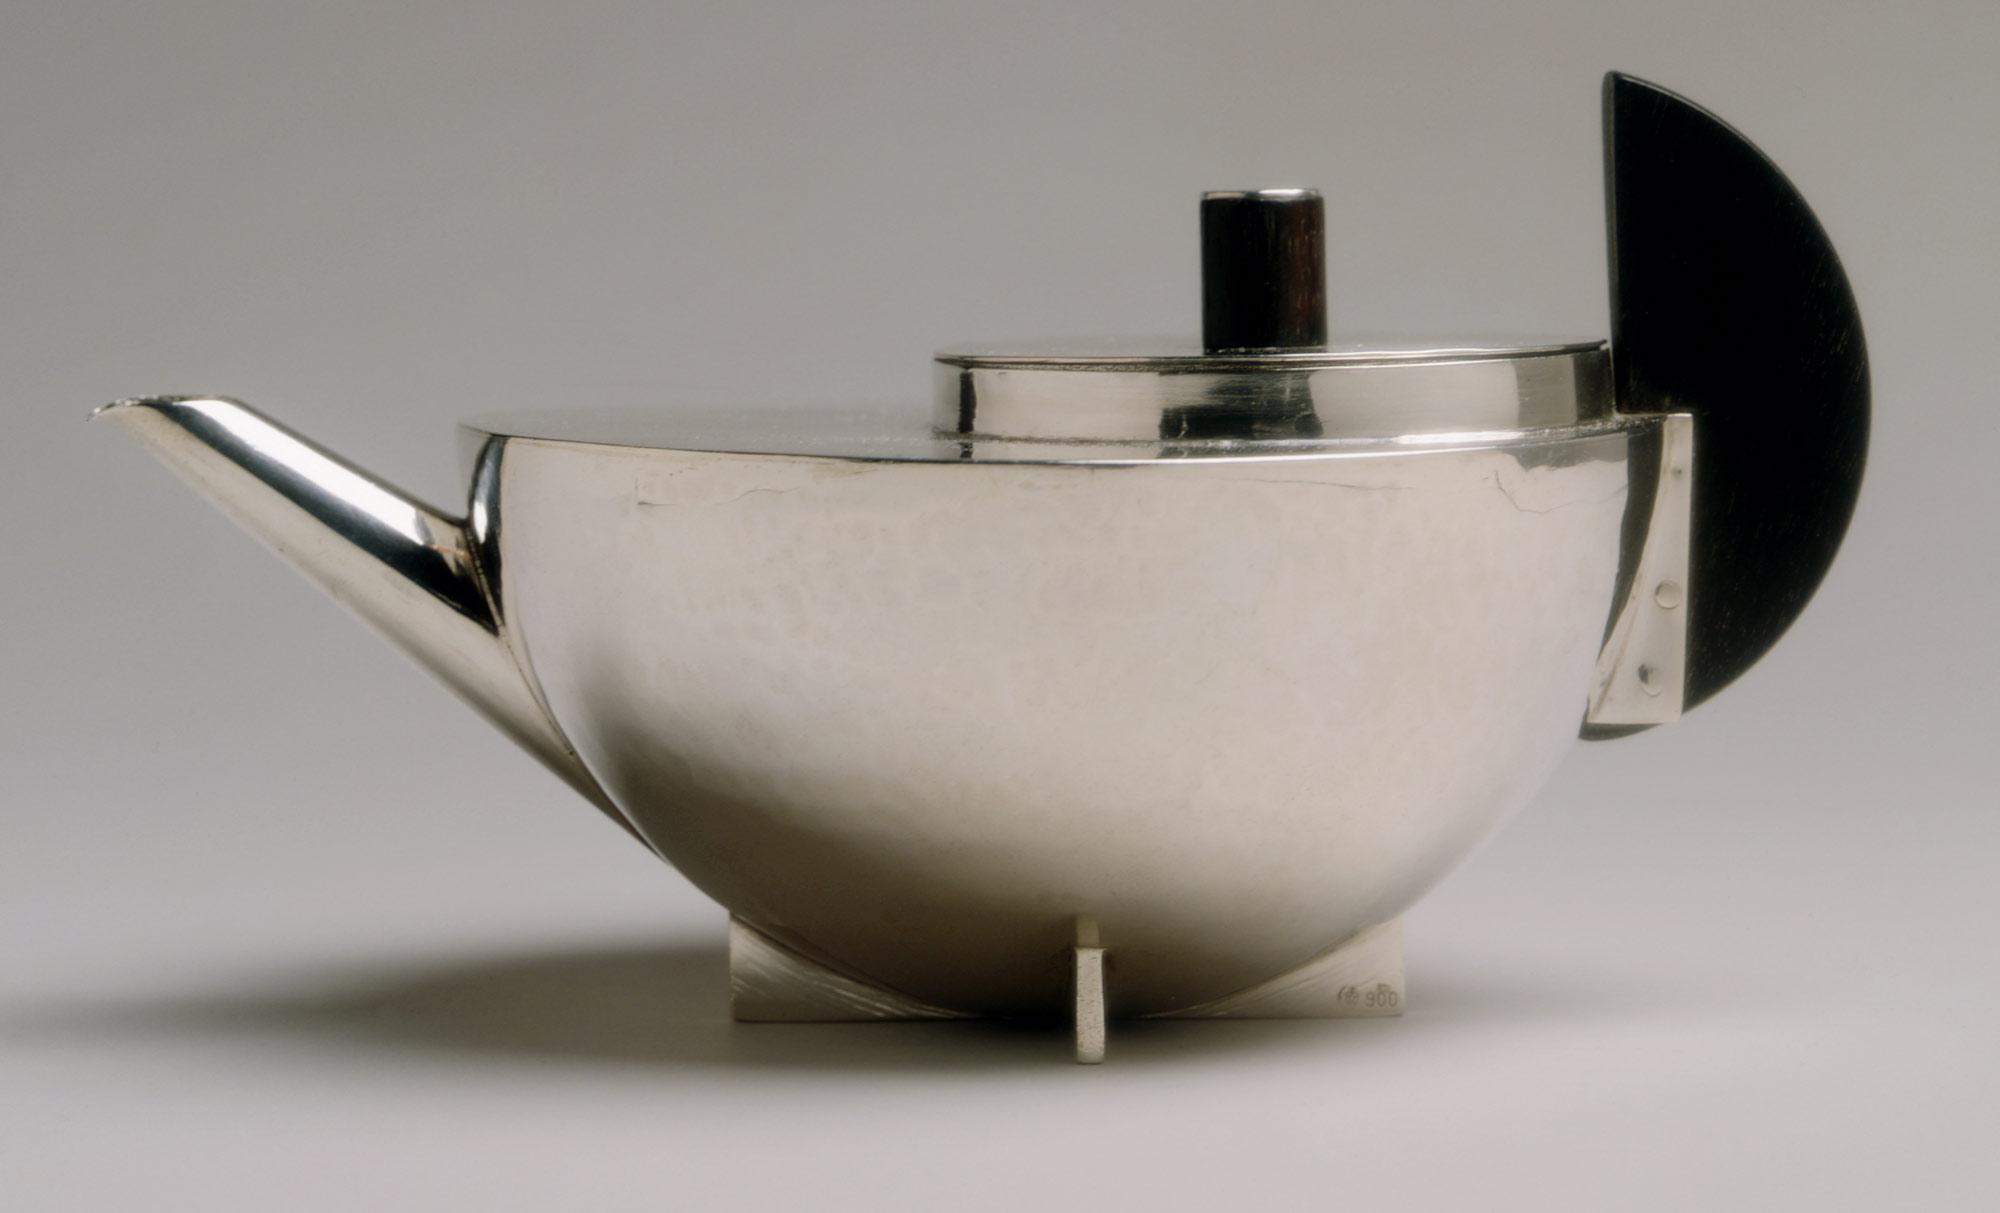 Marianne Brandt's Bauhaus teapot